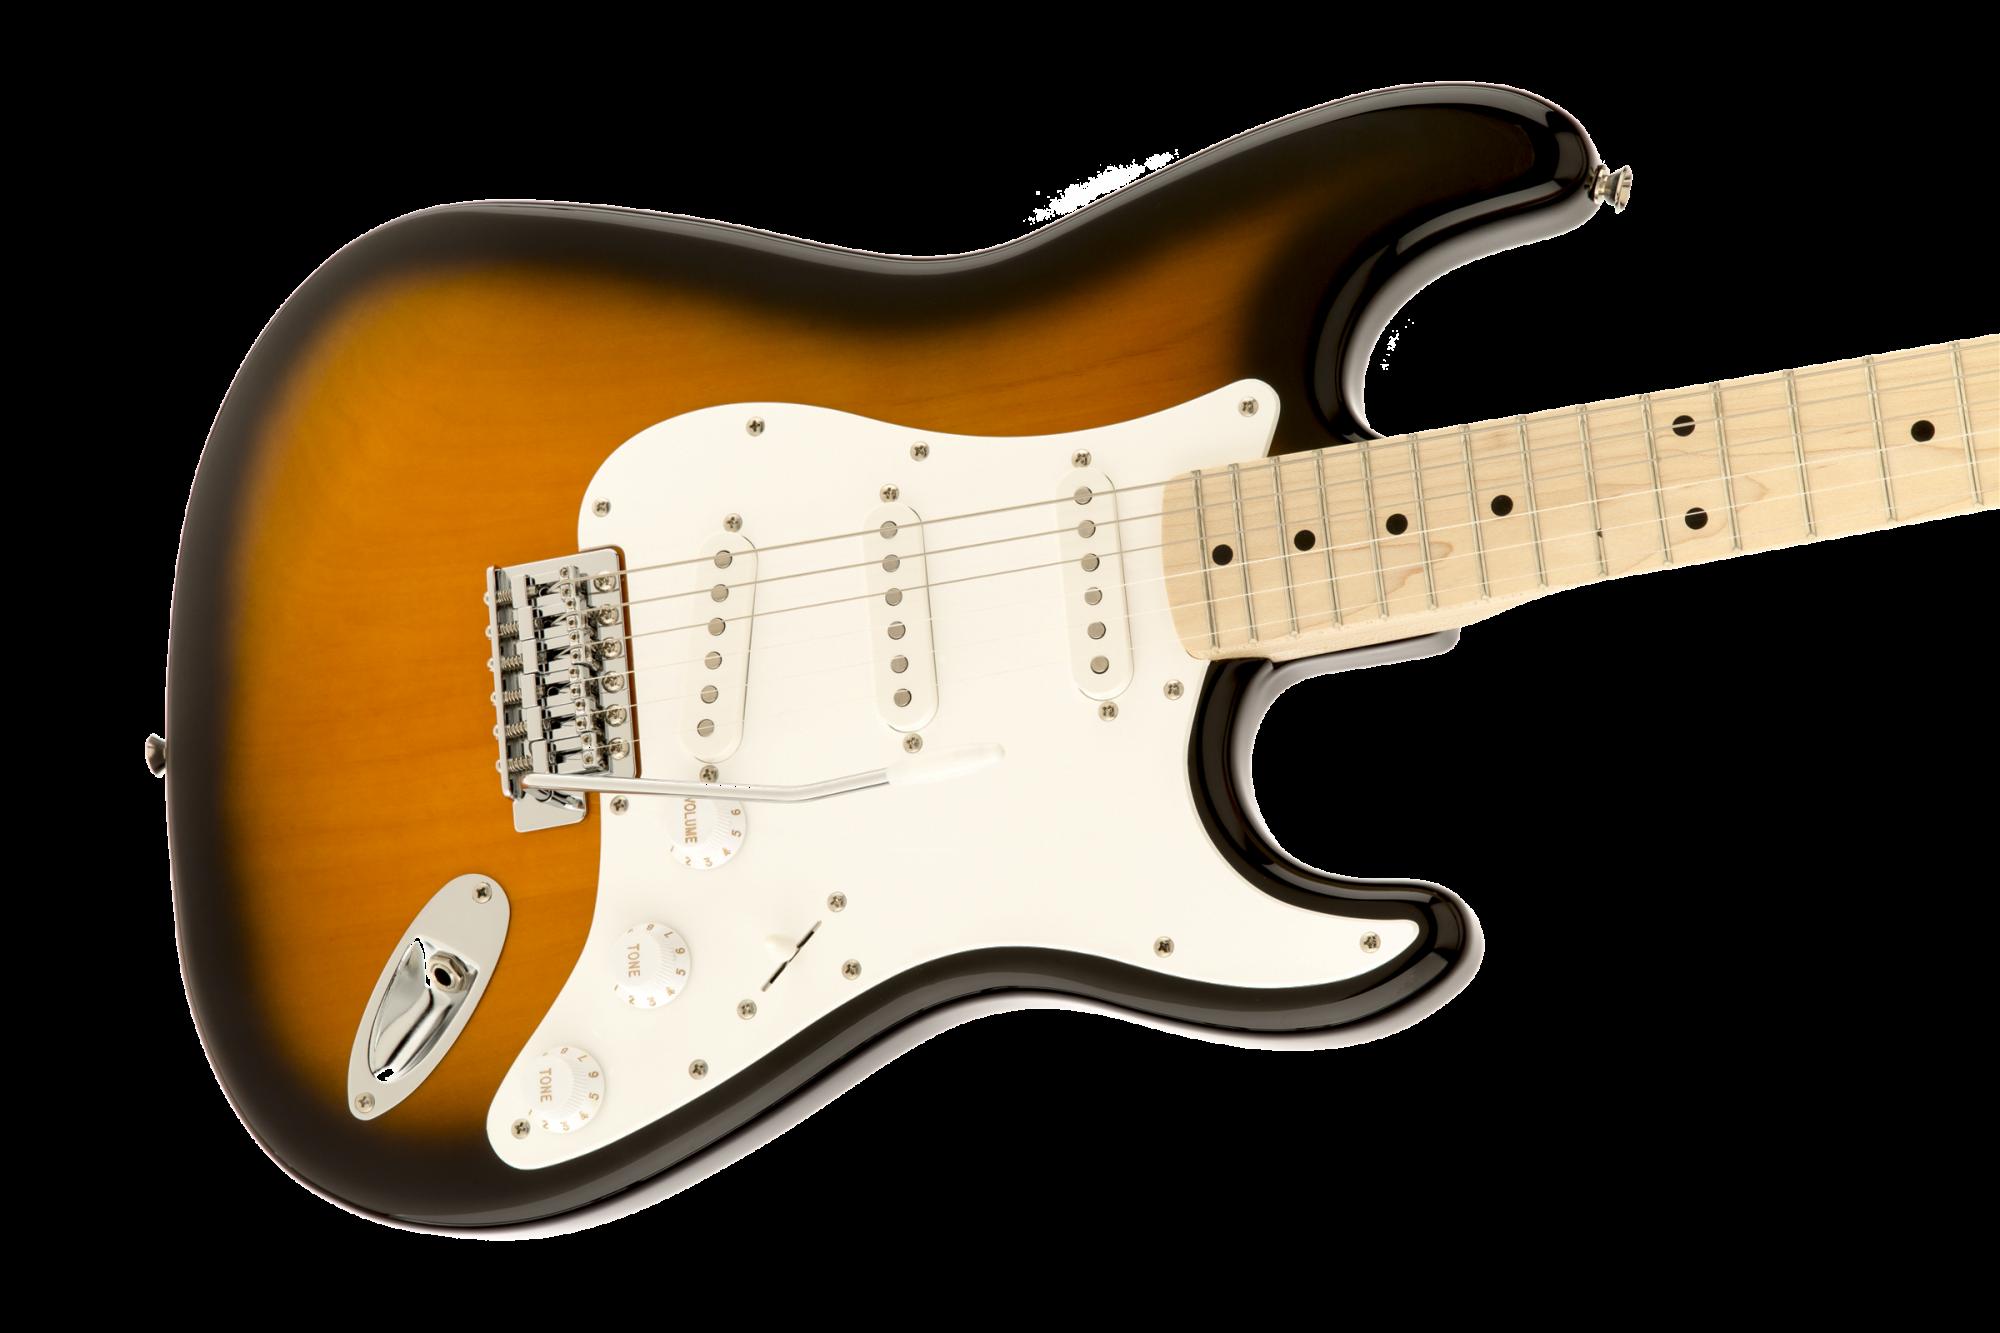 Squier Affinity Series Stratocaster - 2-Color Sunburst